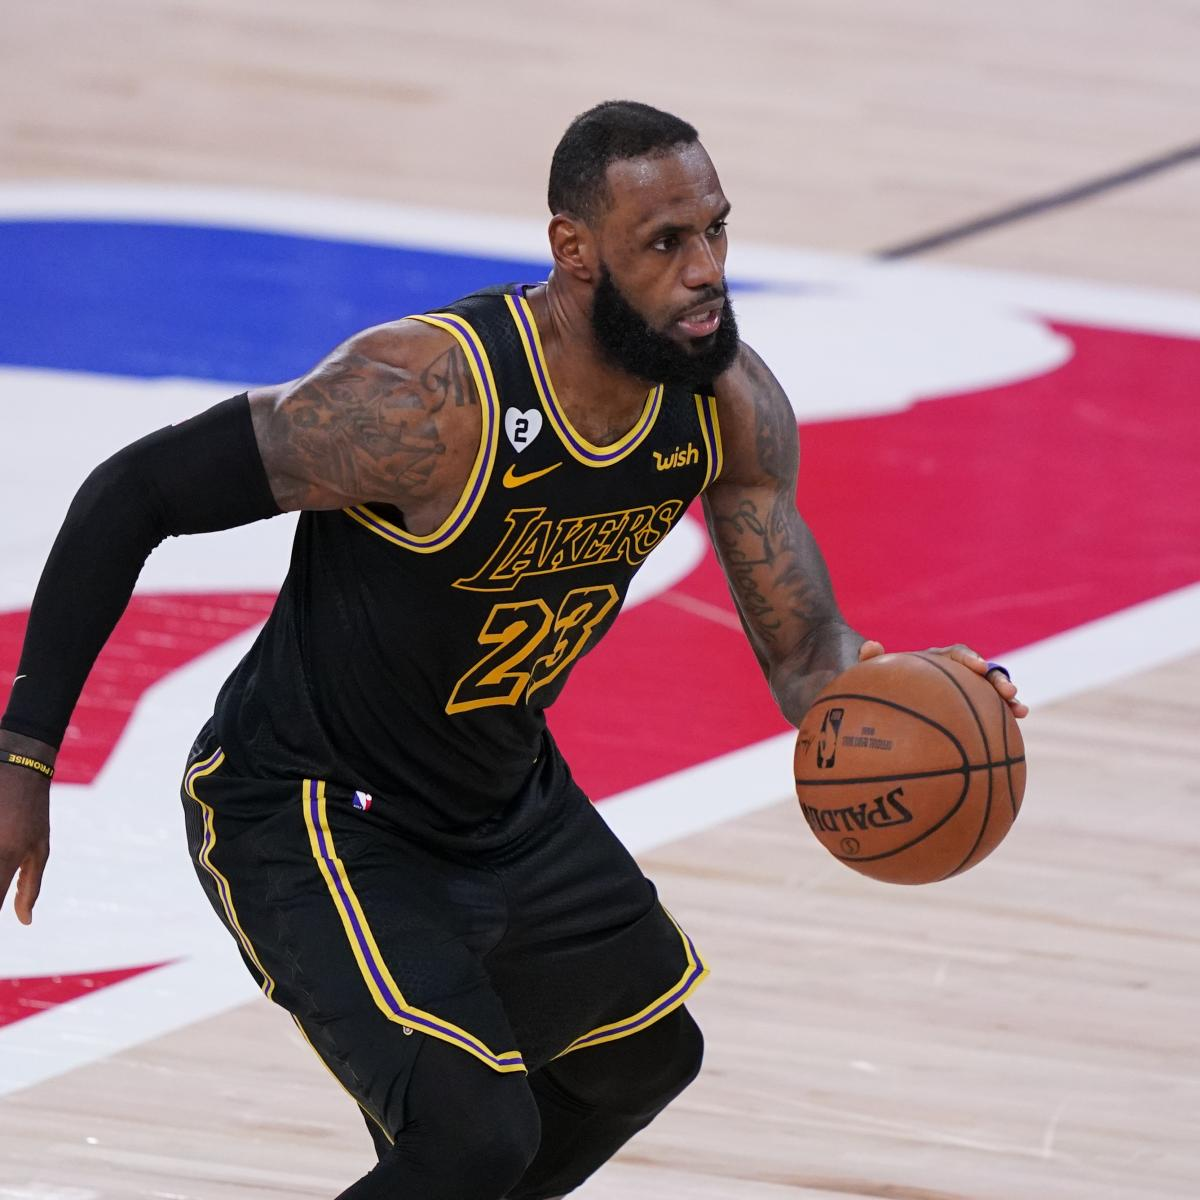 Isiah Thomas: LeBron James Will Pass Kareem Abdul-Jabbar to Become NBA's GOAT